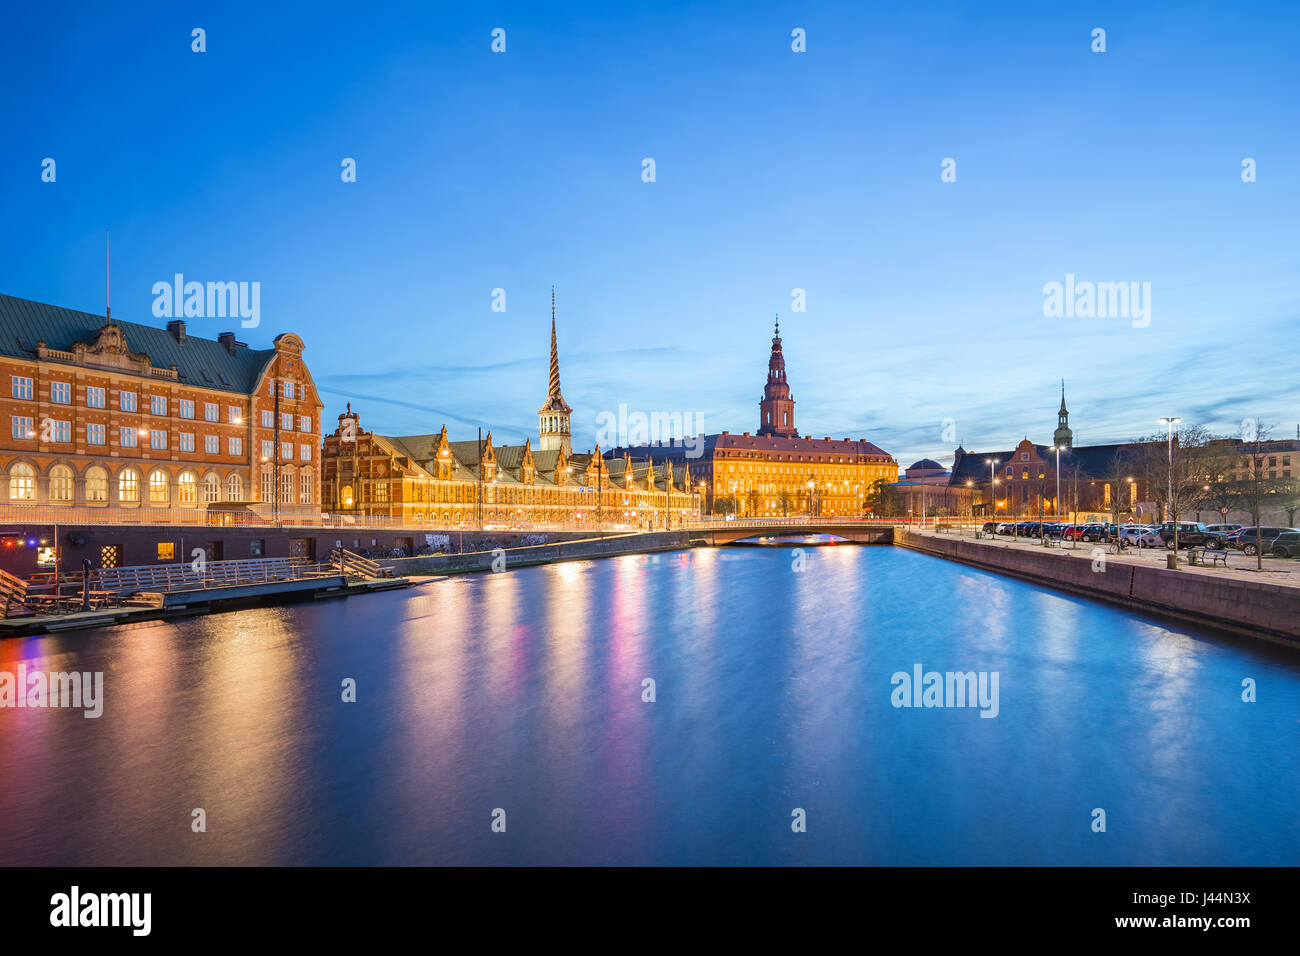 Copenhagen city view of Christiansborg Palace at night in Copenhagen, Denmark - Stock Image